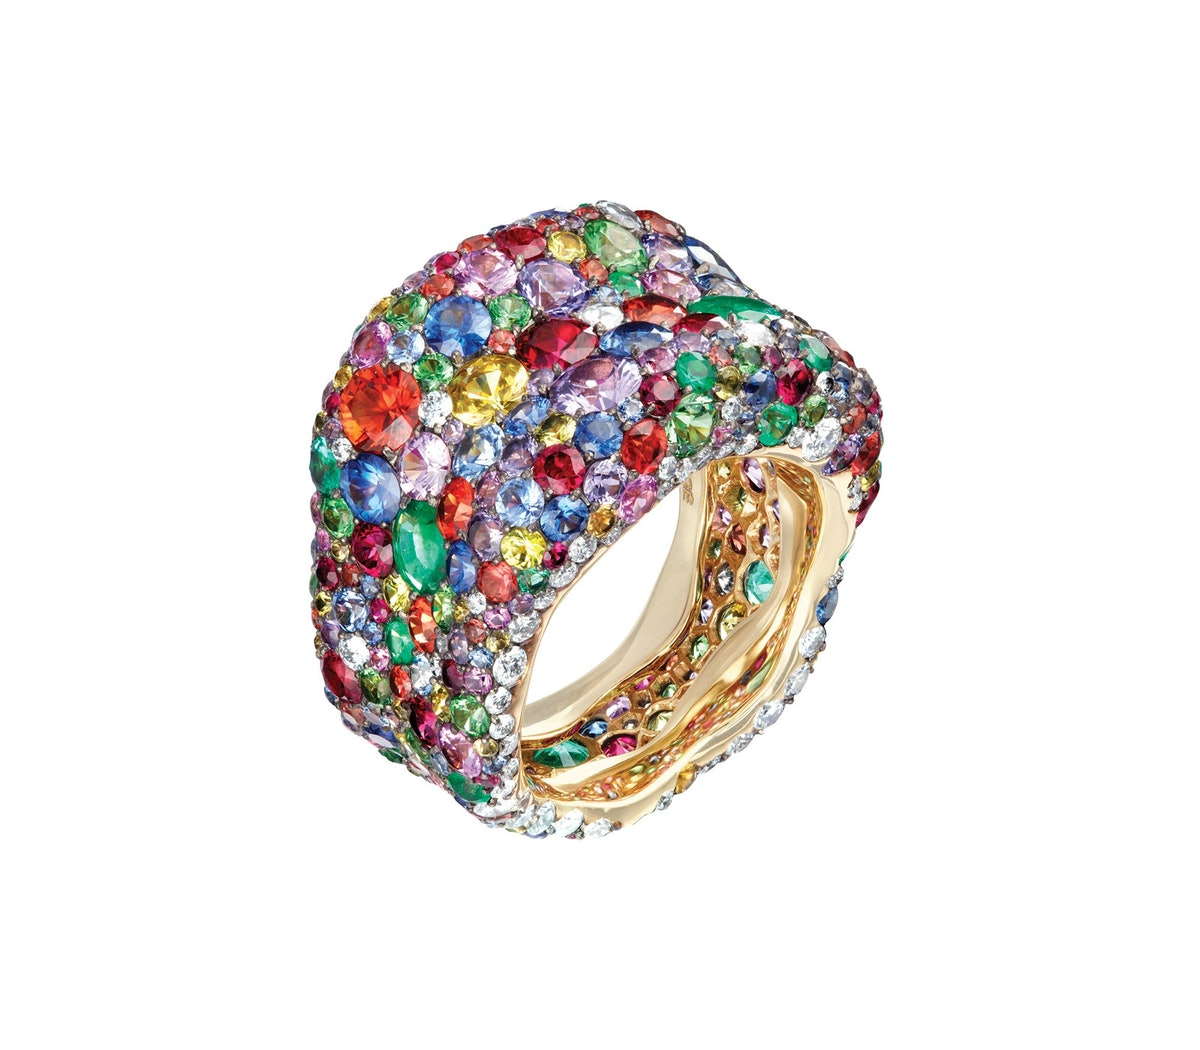 Fabergé 18k yellow gold, ruby, tsavorite, emerald, multi-colored sapphire, and diamond ring